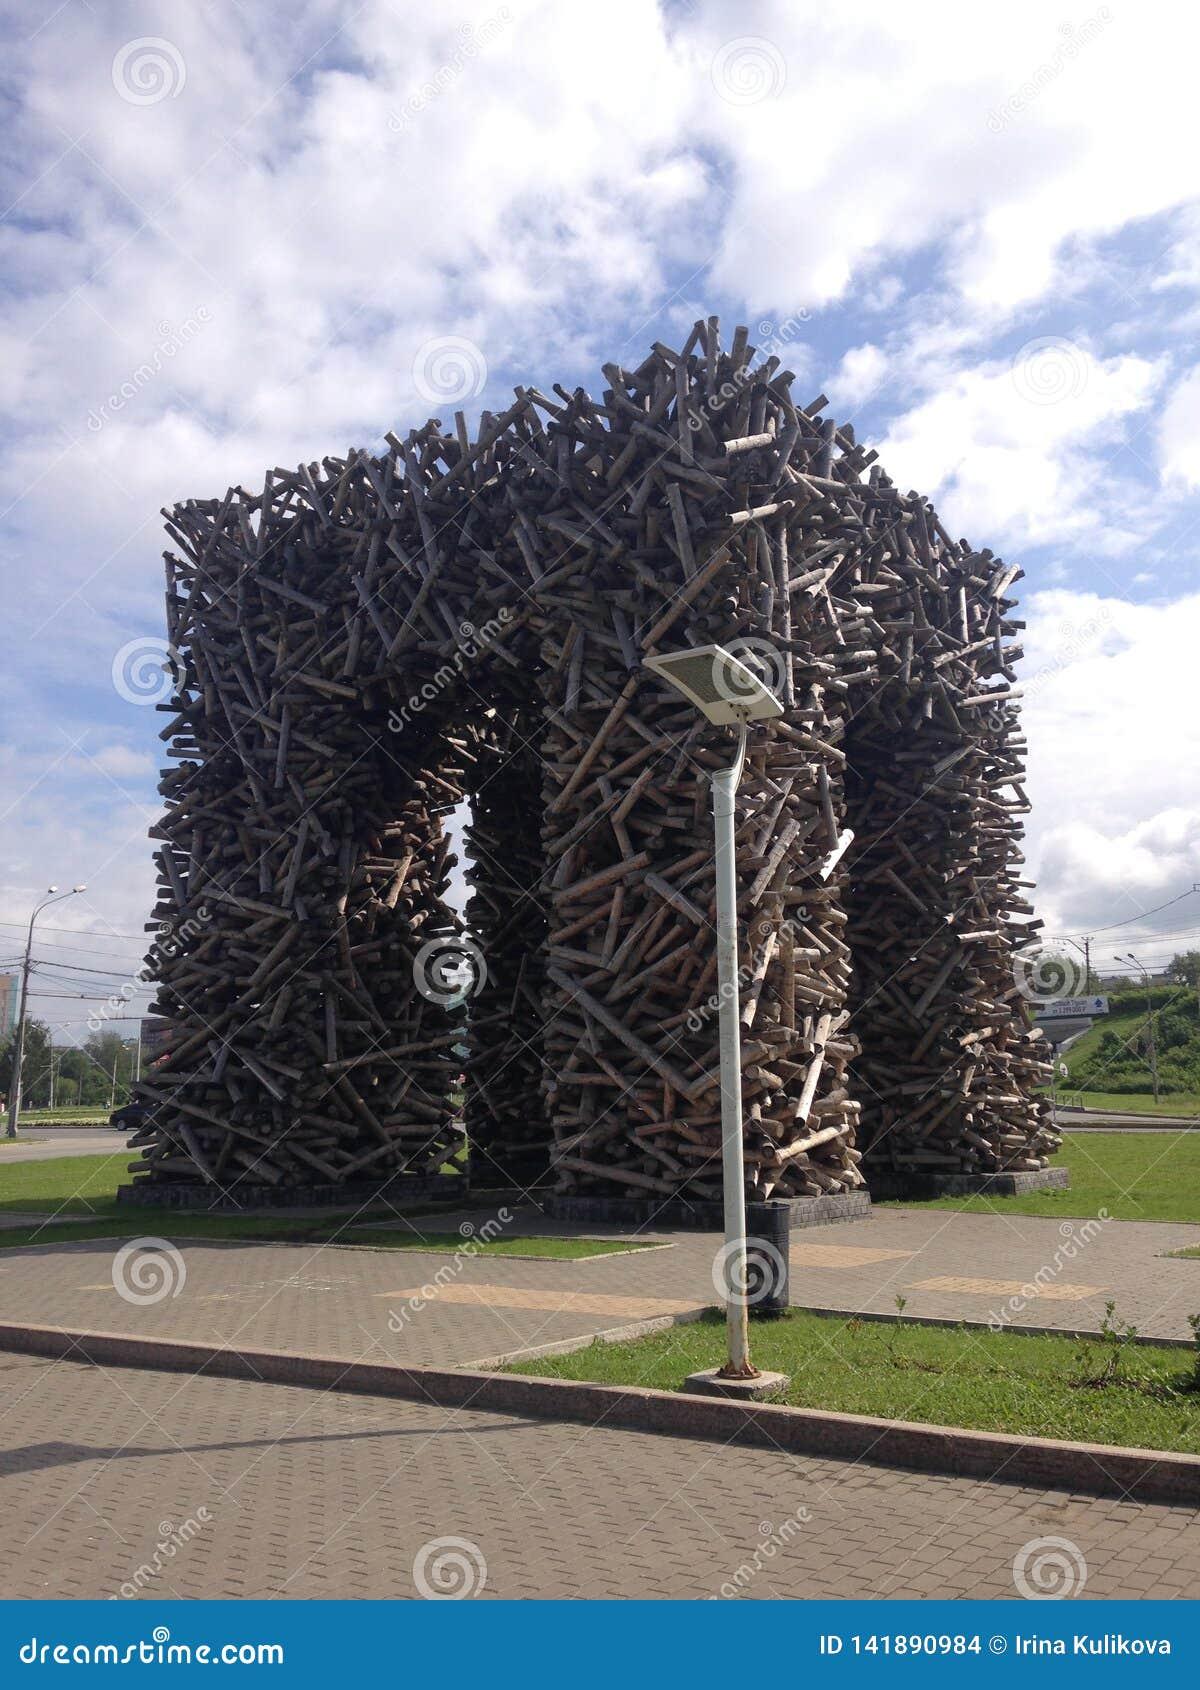 Art object `Perm gate` in Perm, Russia